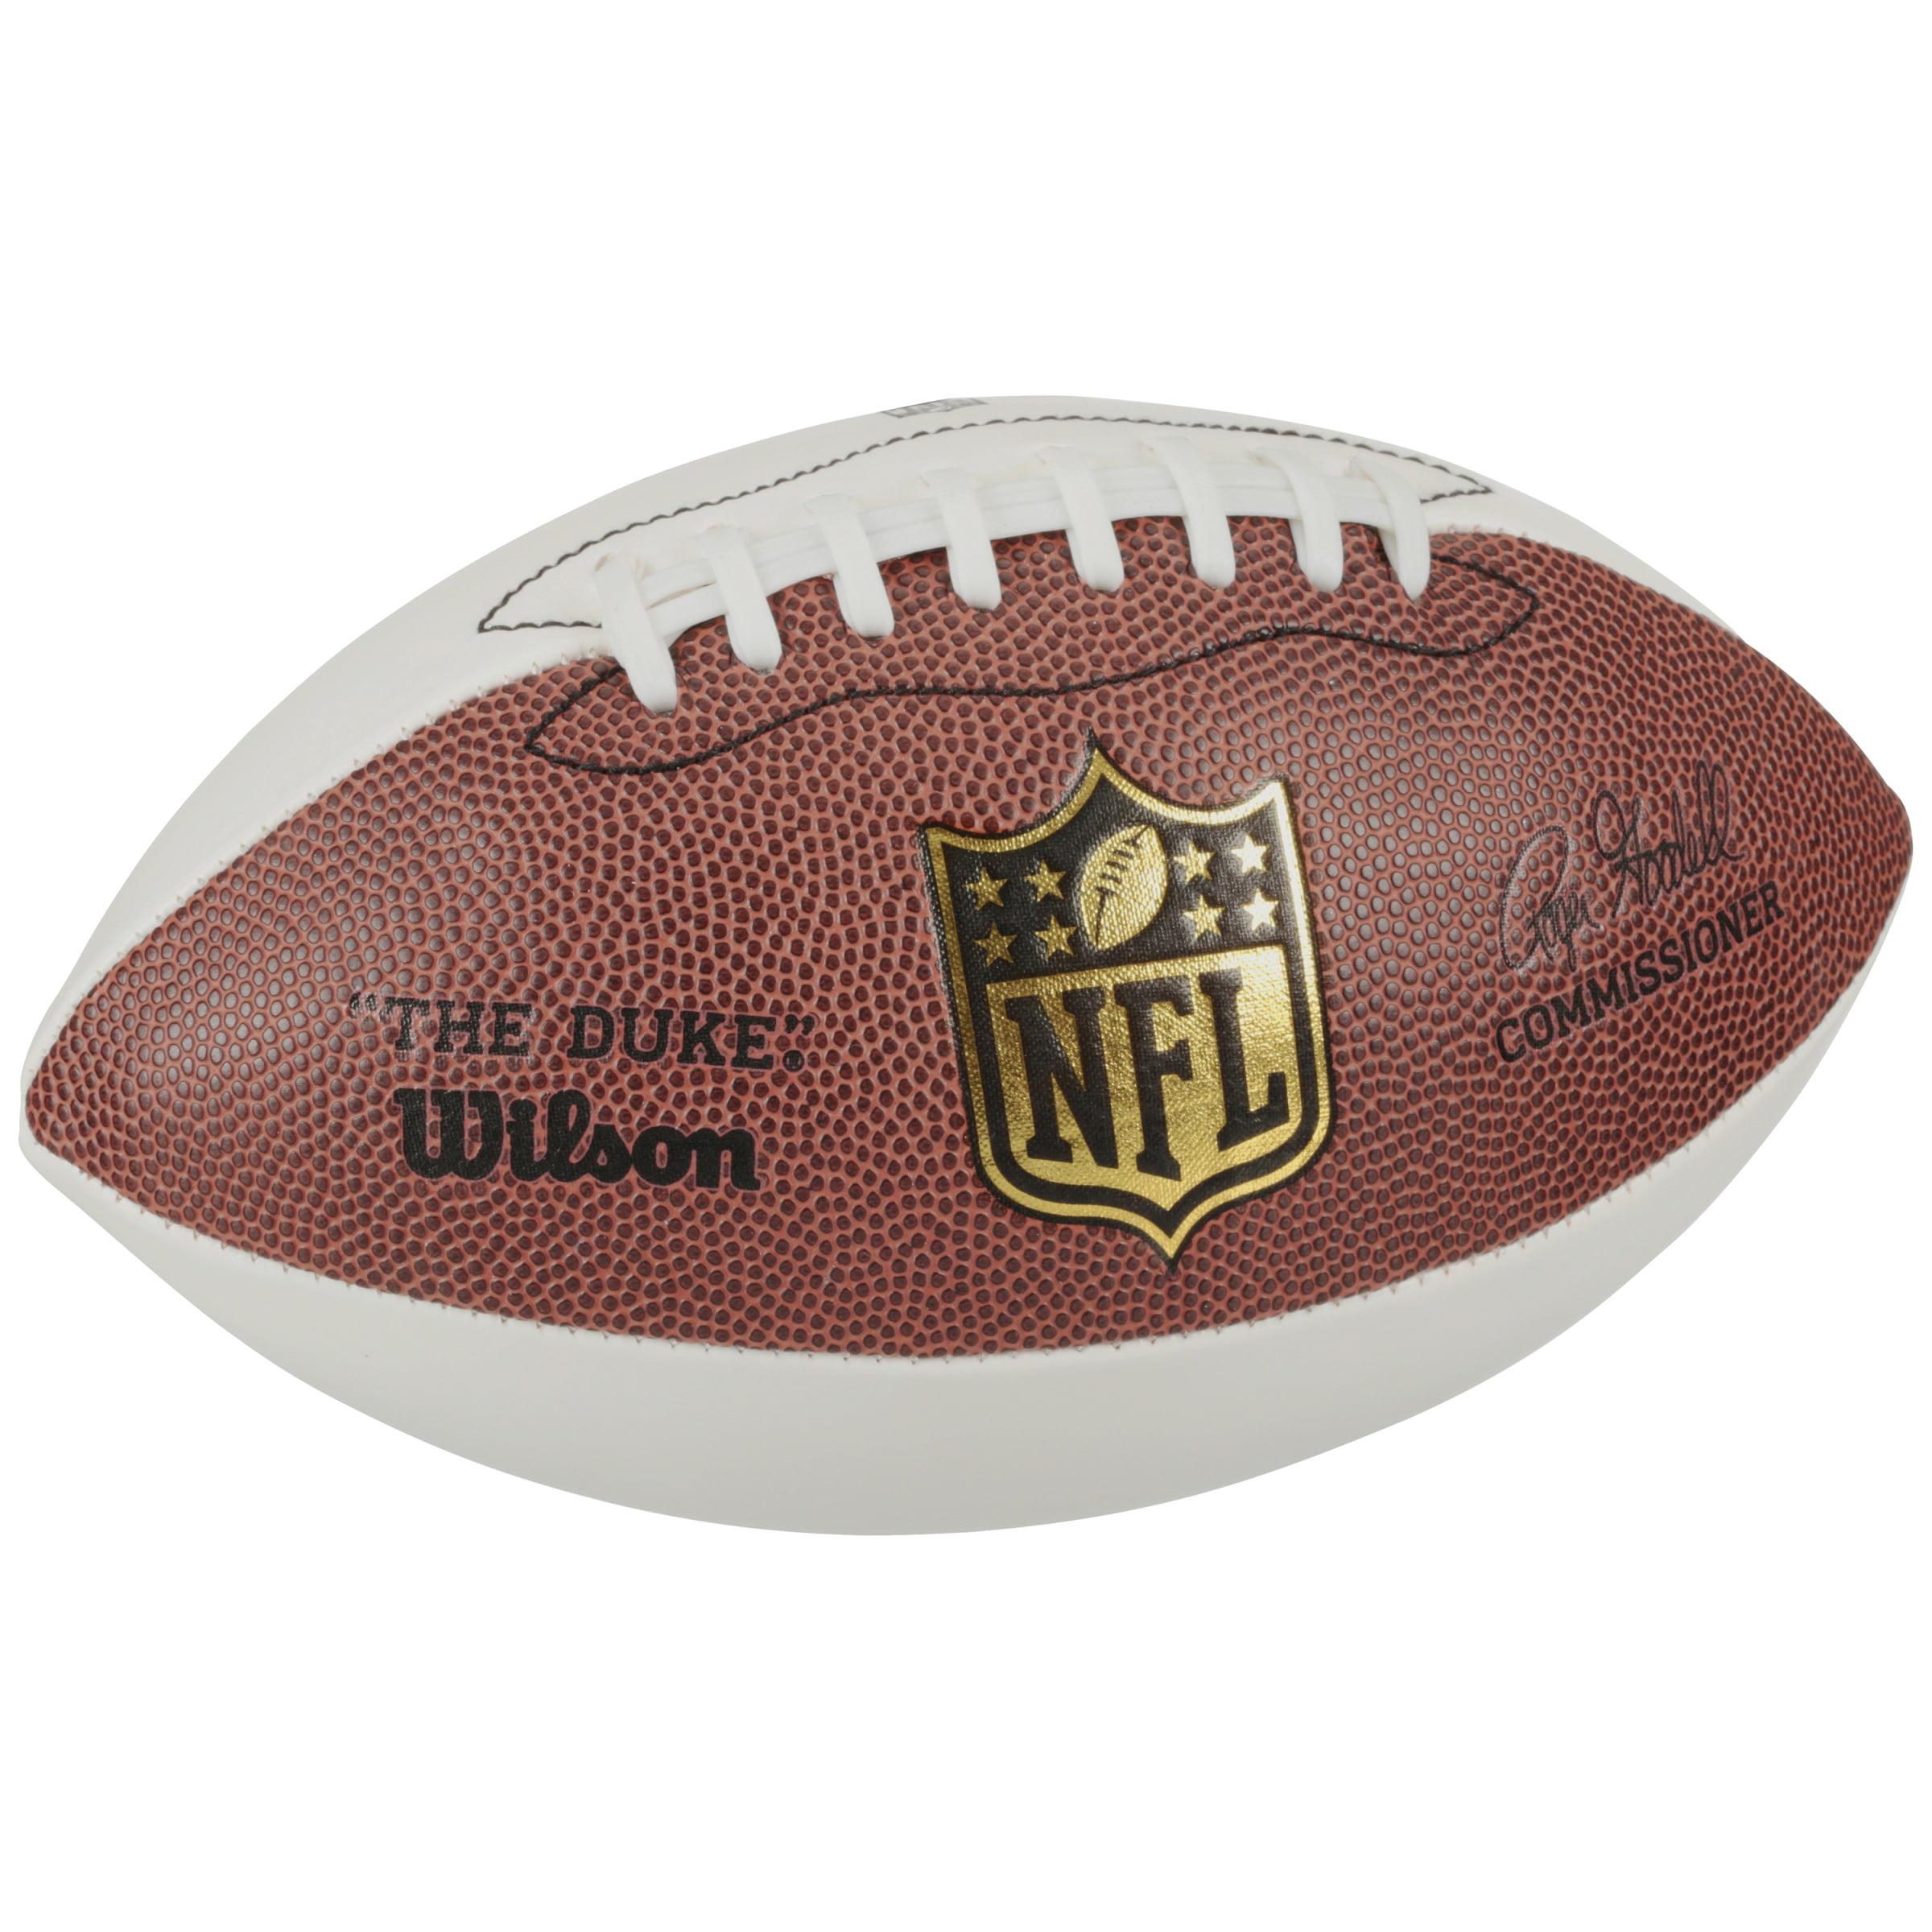 Wilson Official Nfl The Duke Autograph Leather Football Walmart Com